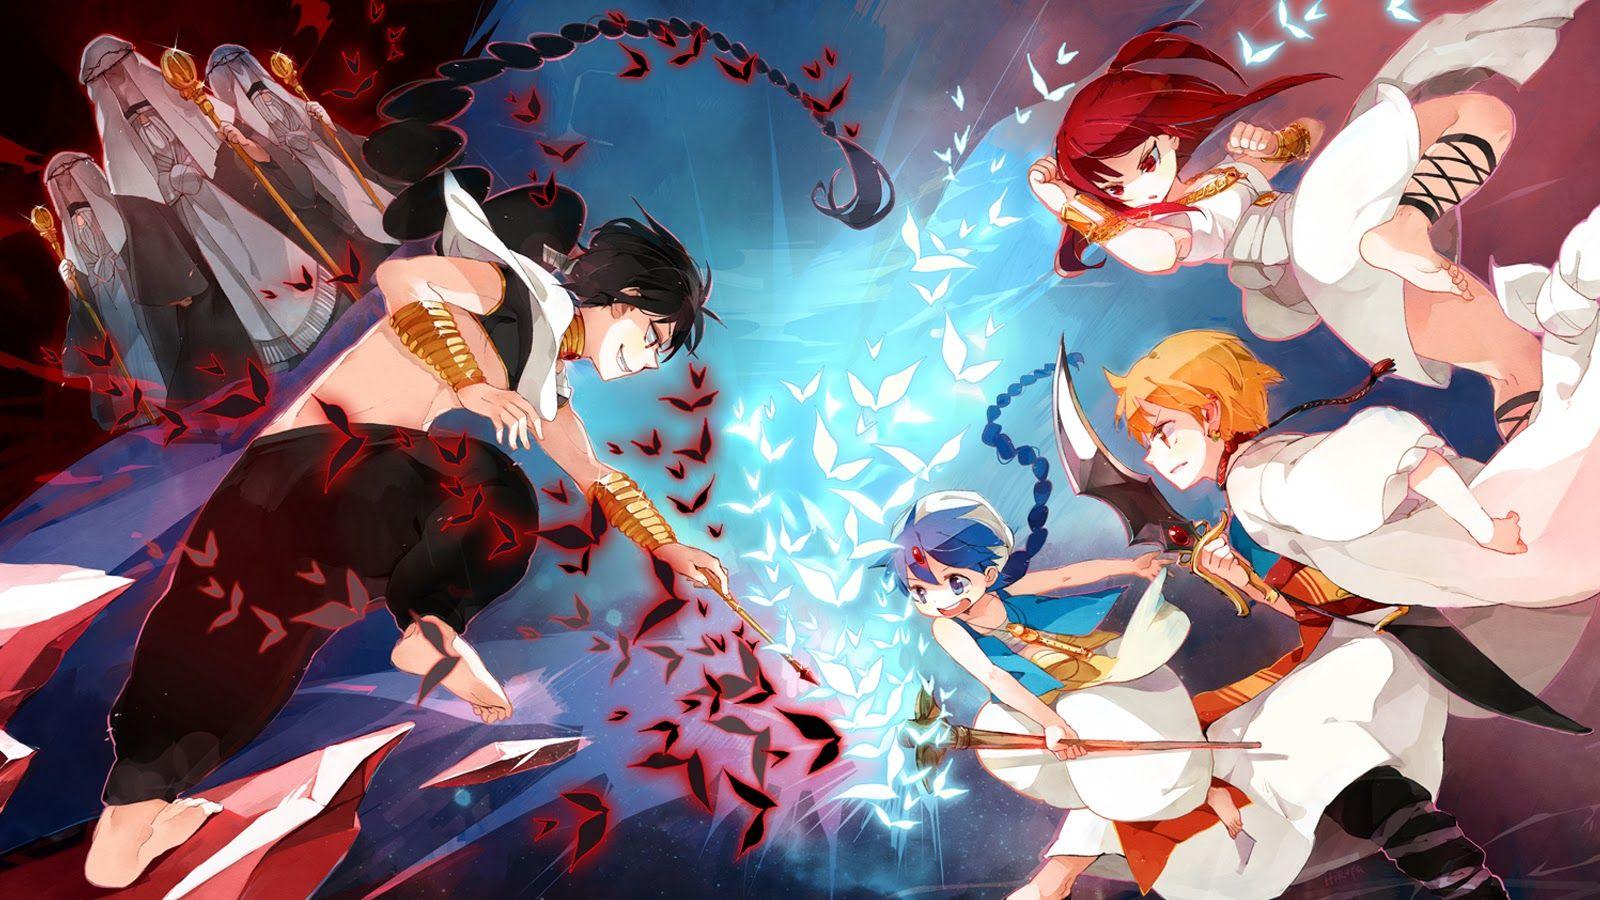 kingdom anime season 1 episode 5